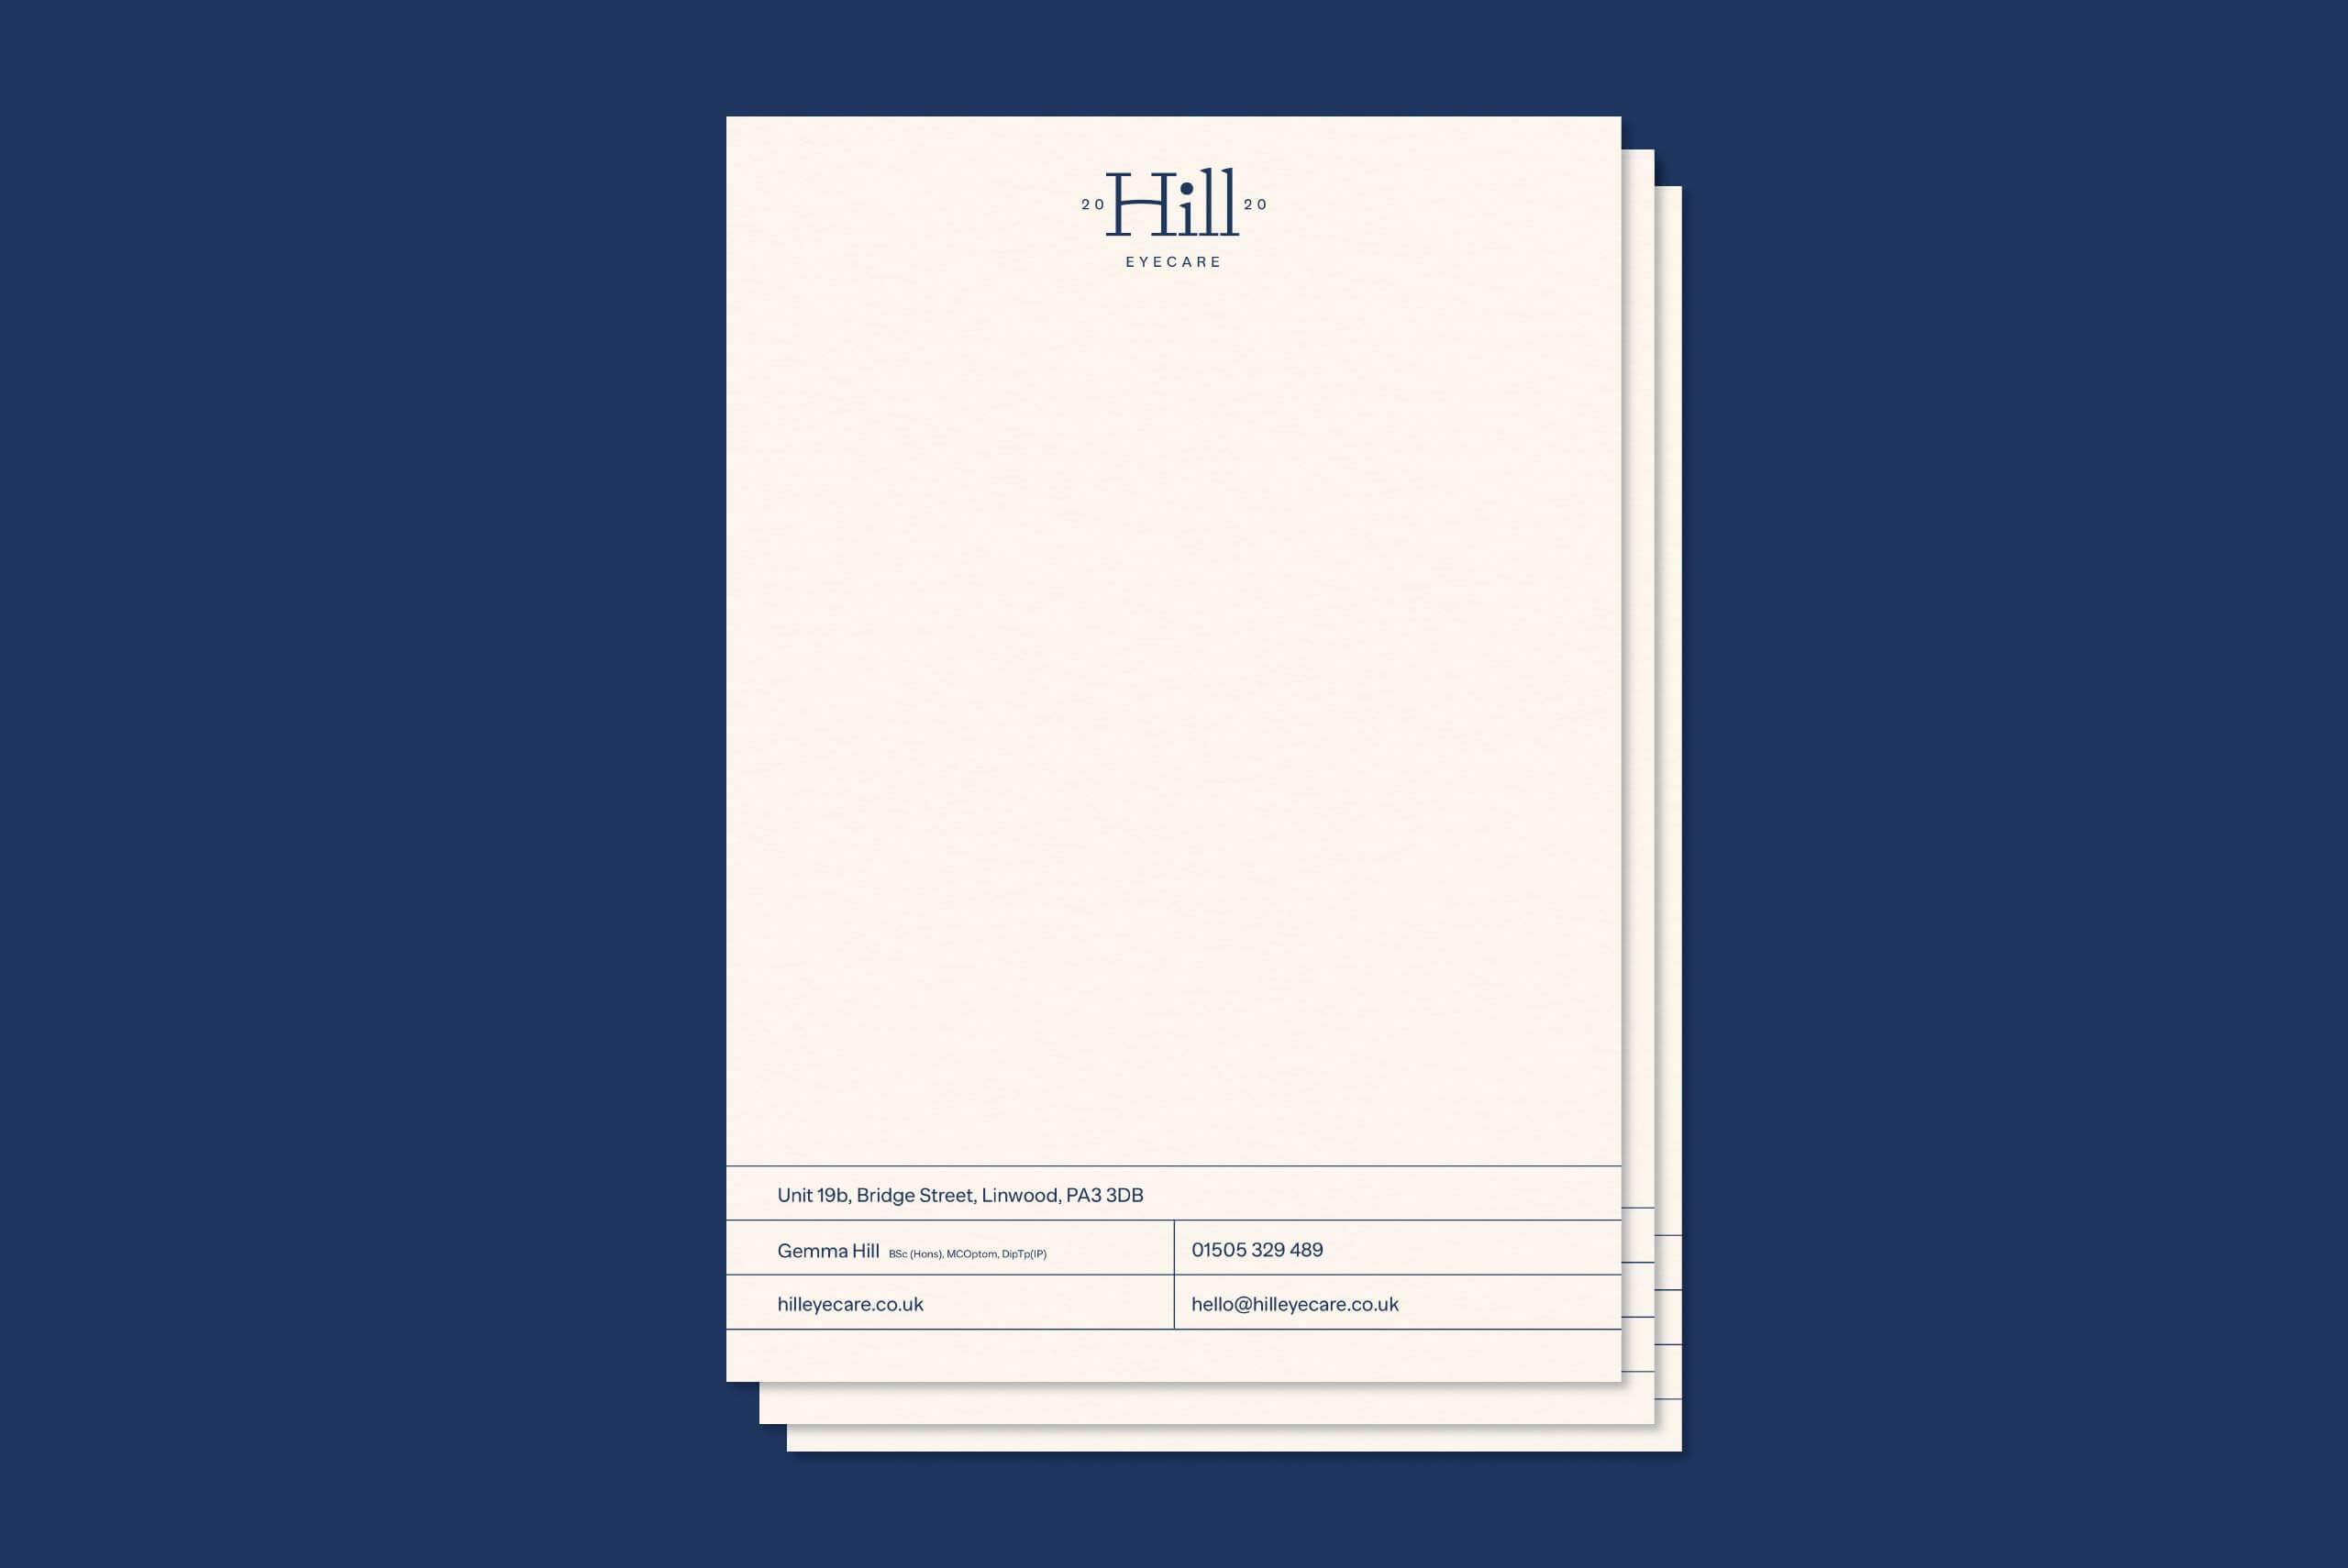 FRH-Hill-Eyecare1-copy-19